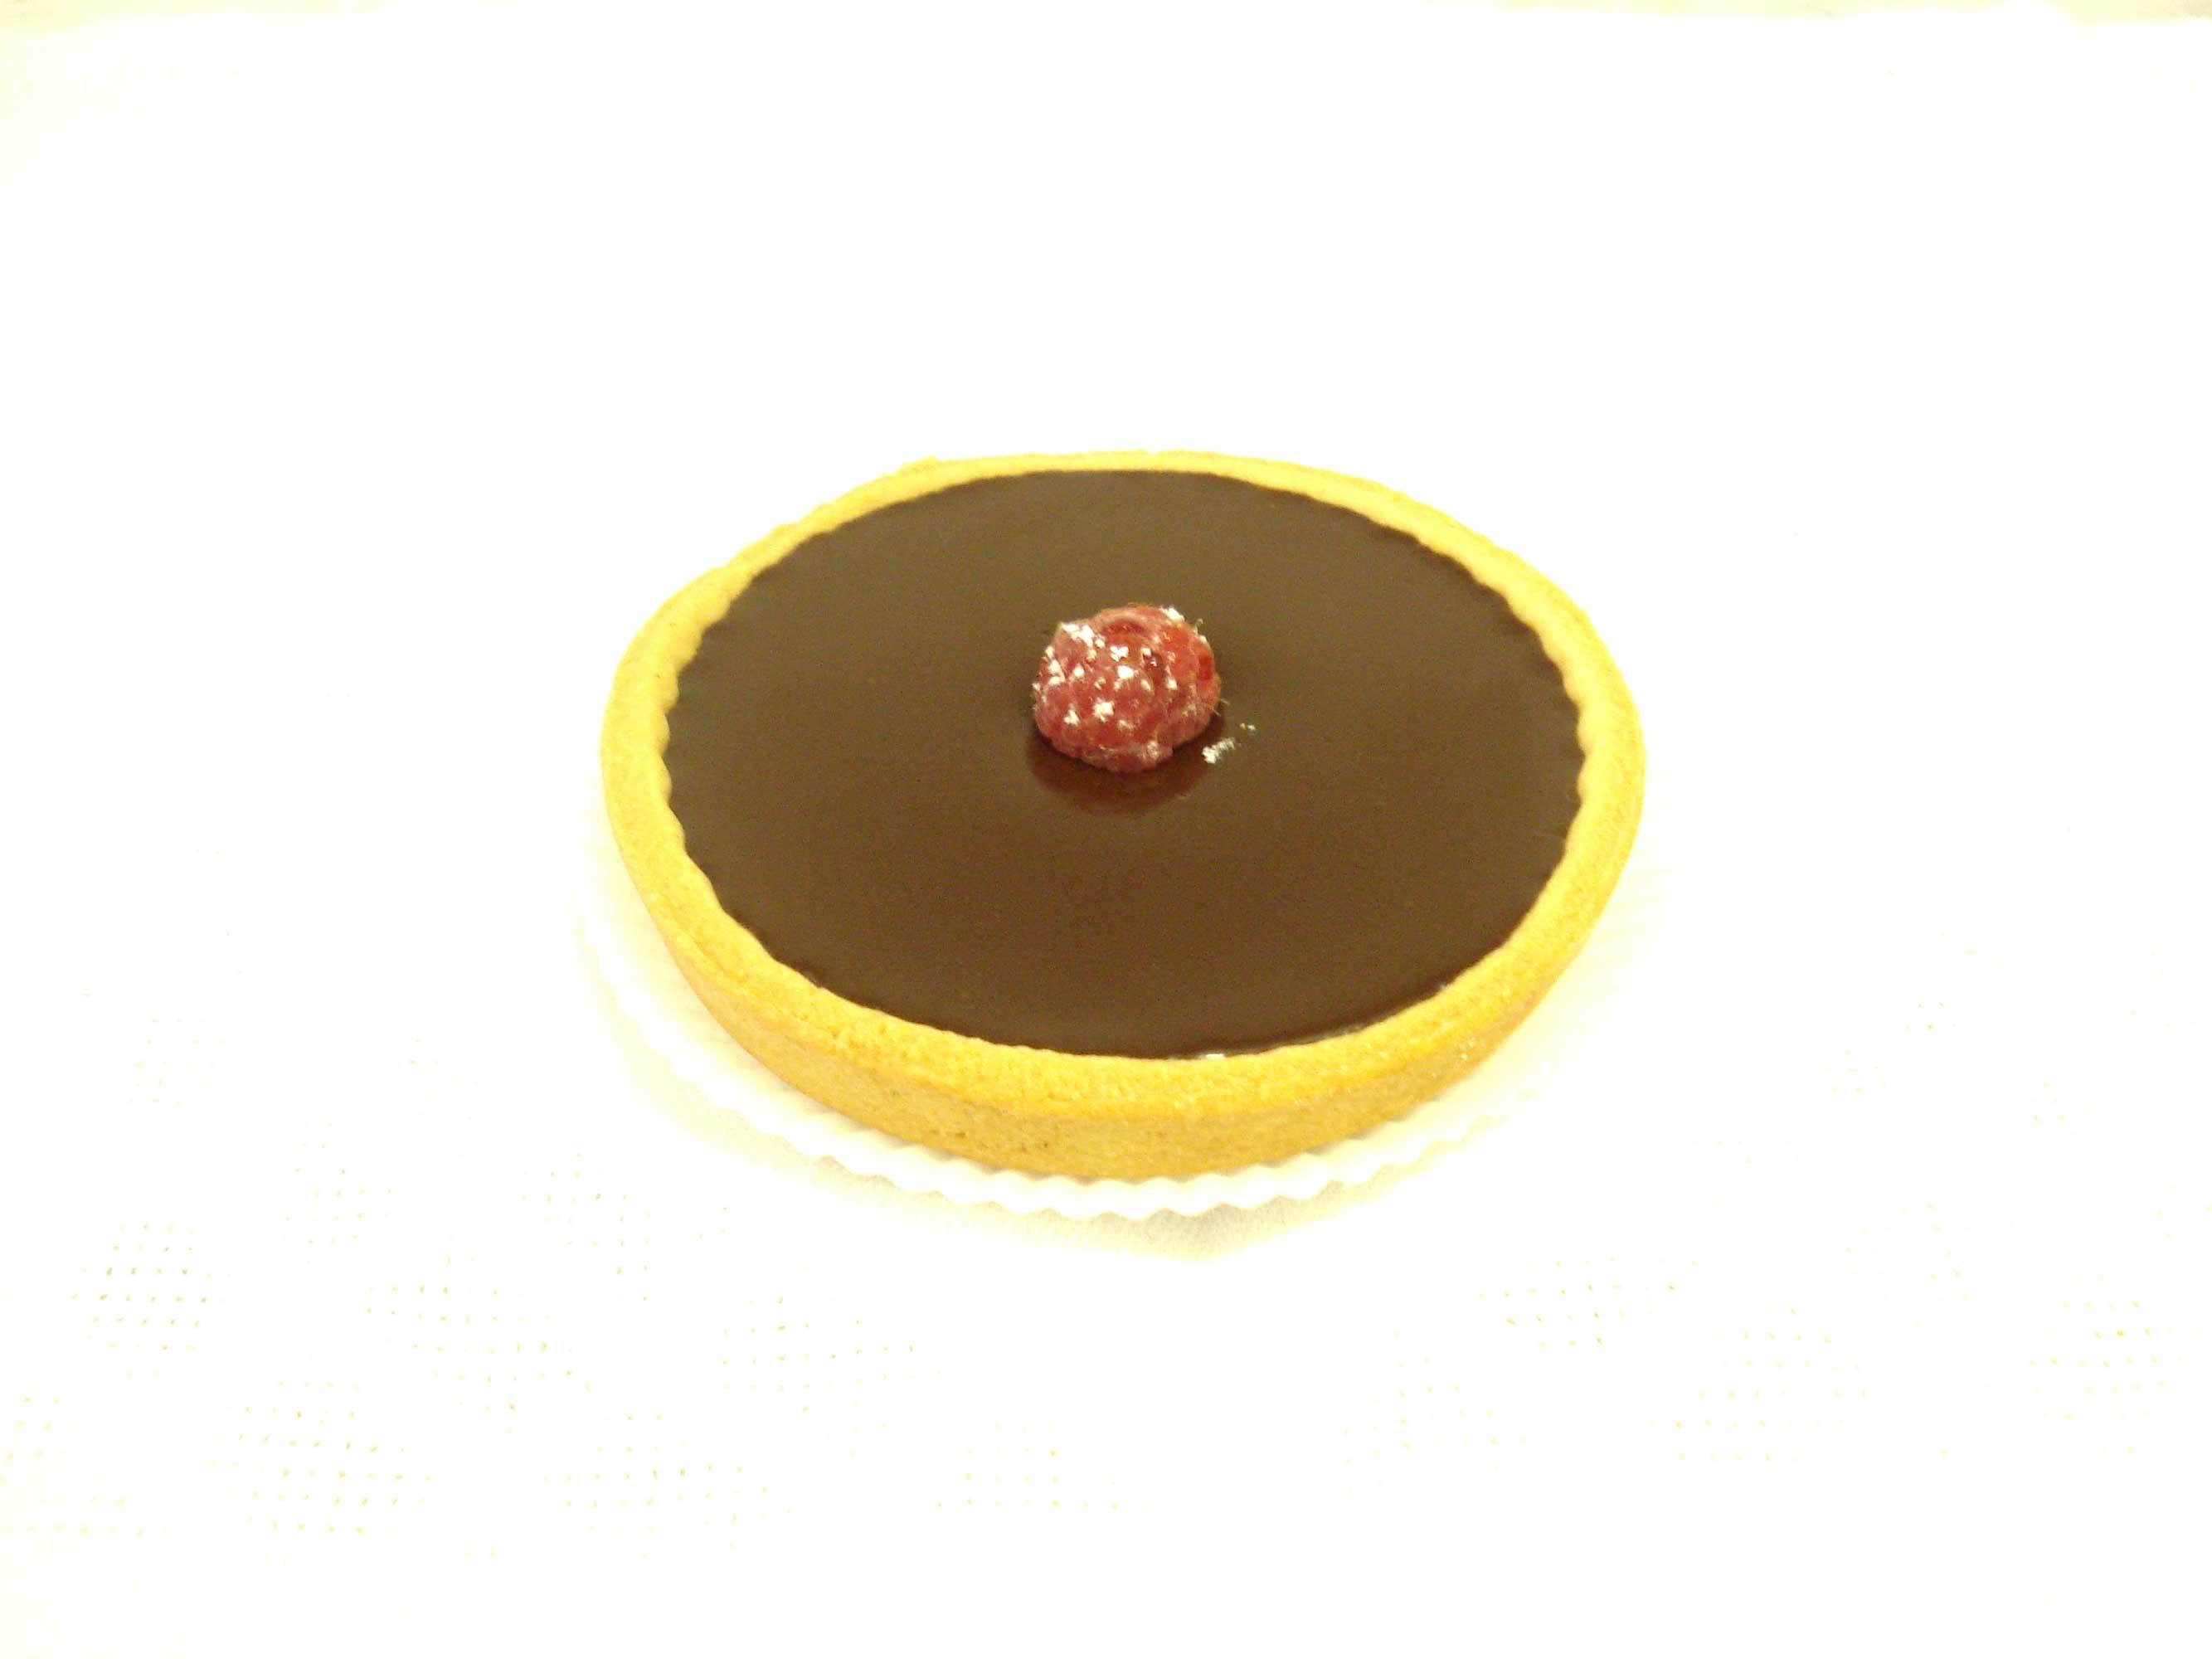 Tarte-au-chocolat-Schokoladentarte